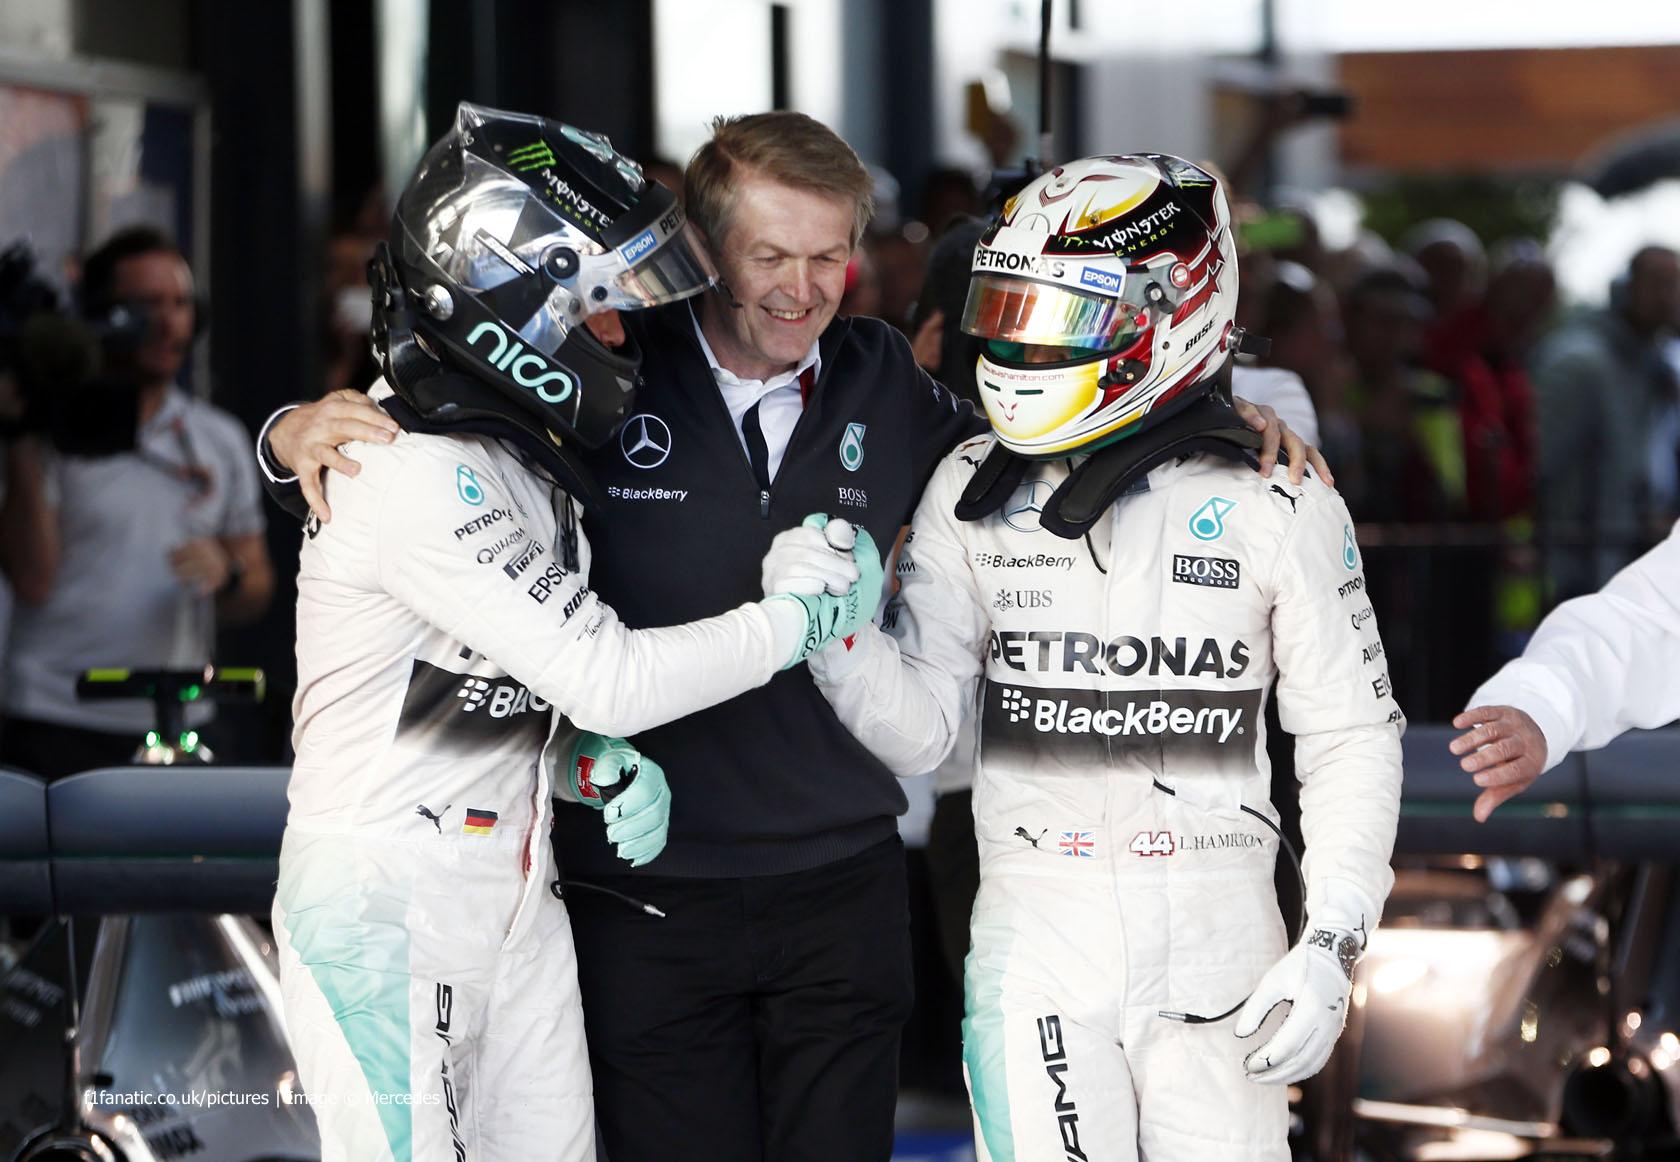 Nico Rosberg, Lewis Hamilton, Mercedes, Albert Park, 2015